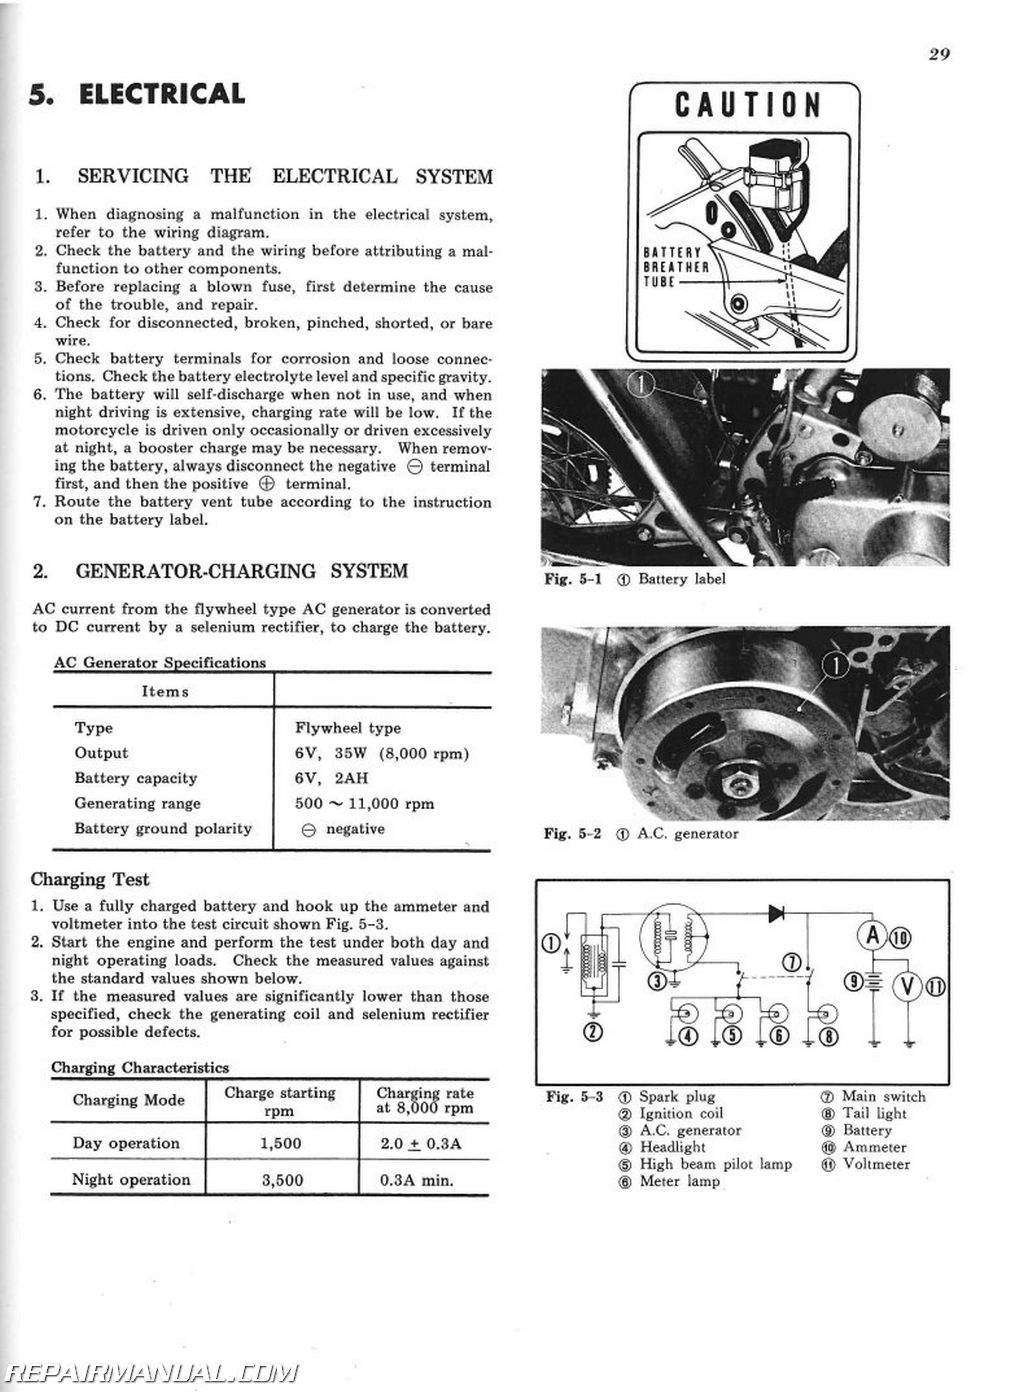 Honda Sl70 Xl70 Service Manual